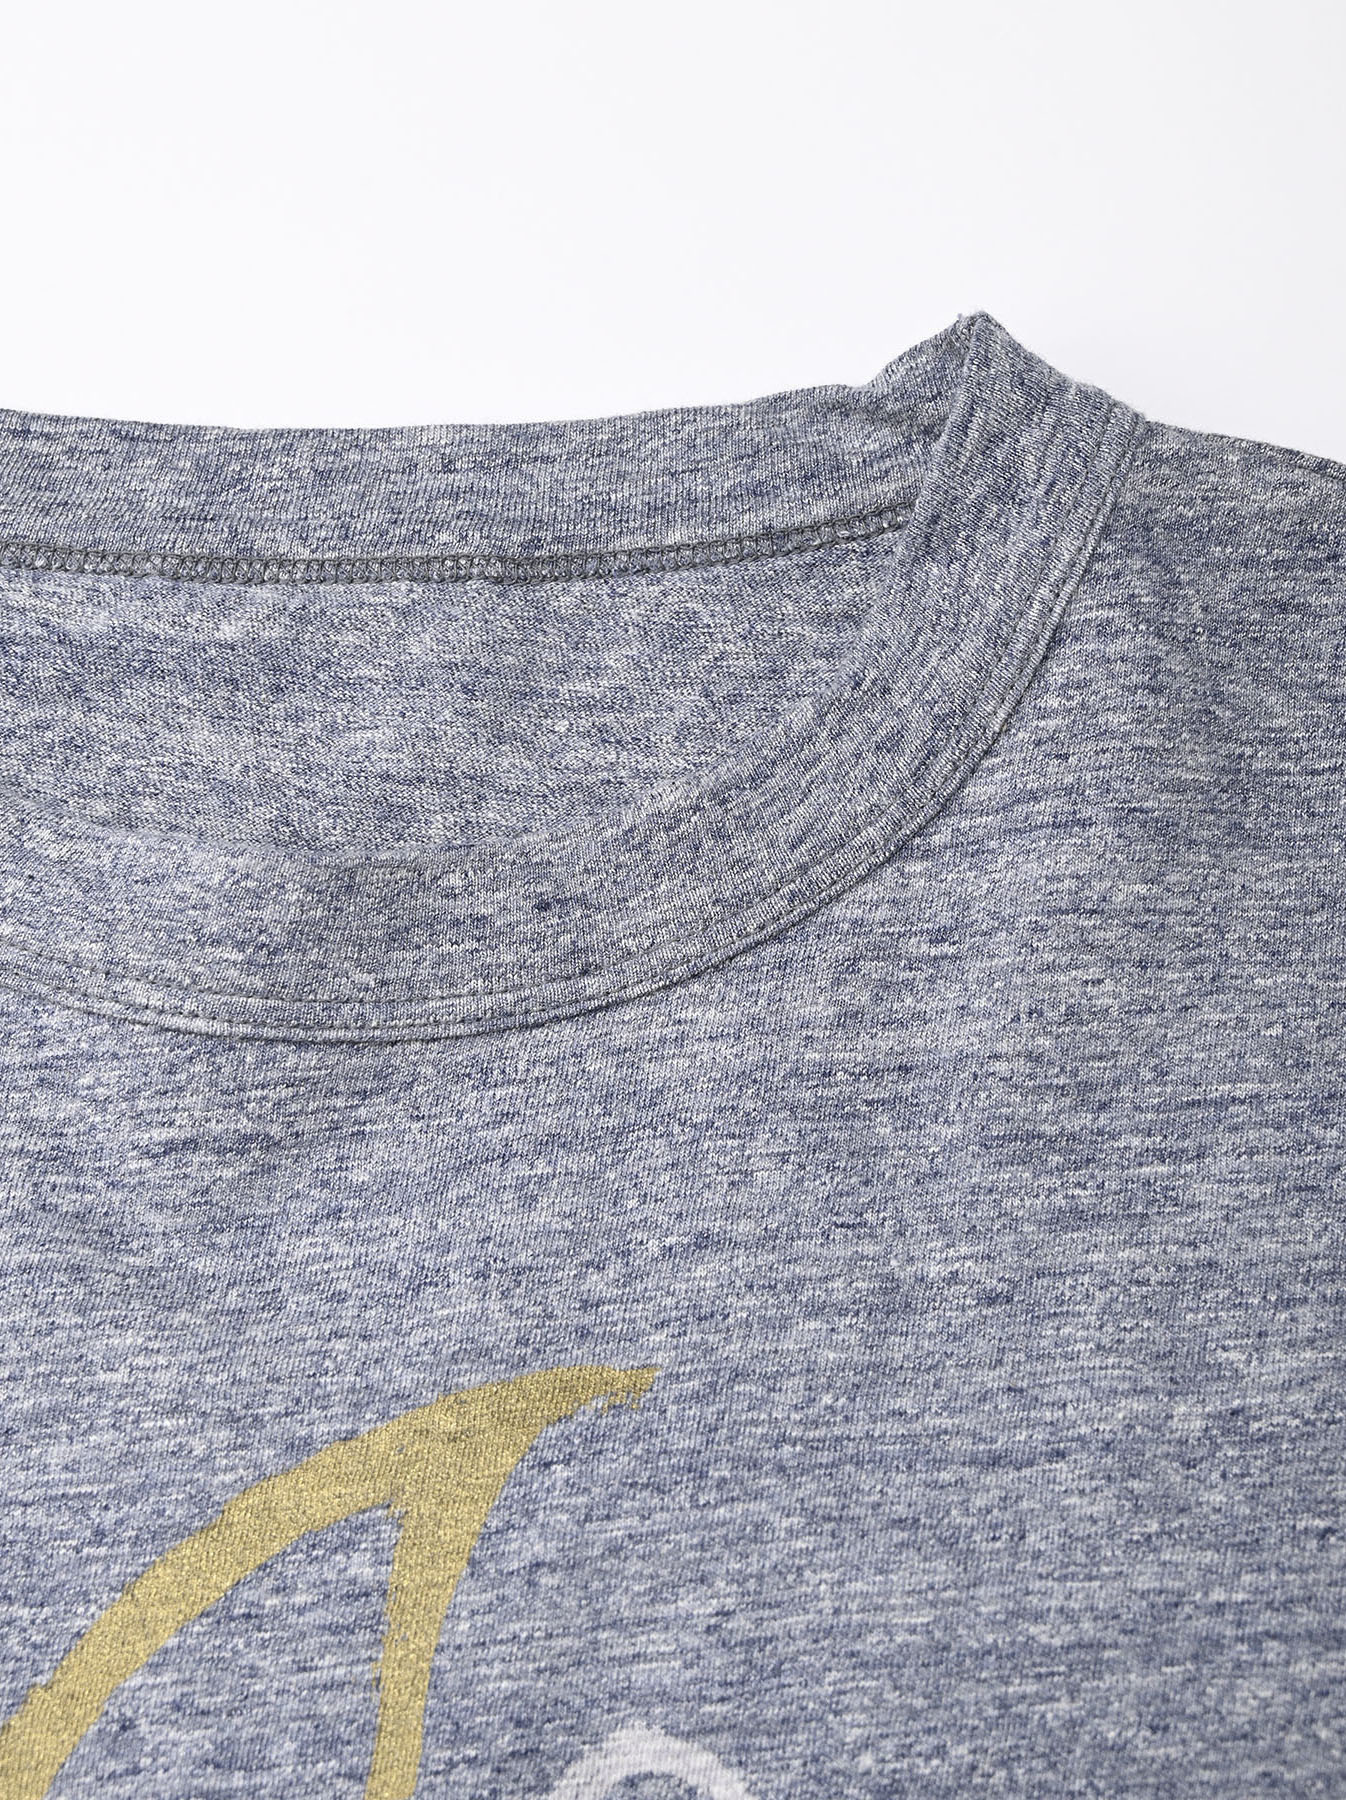 Top Sumite de Owl T-shirt-7